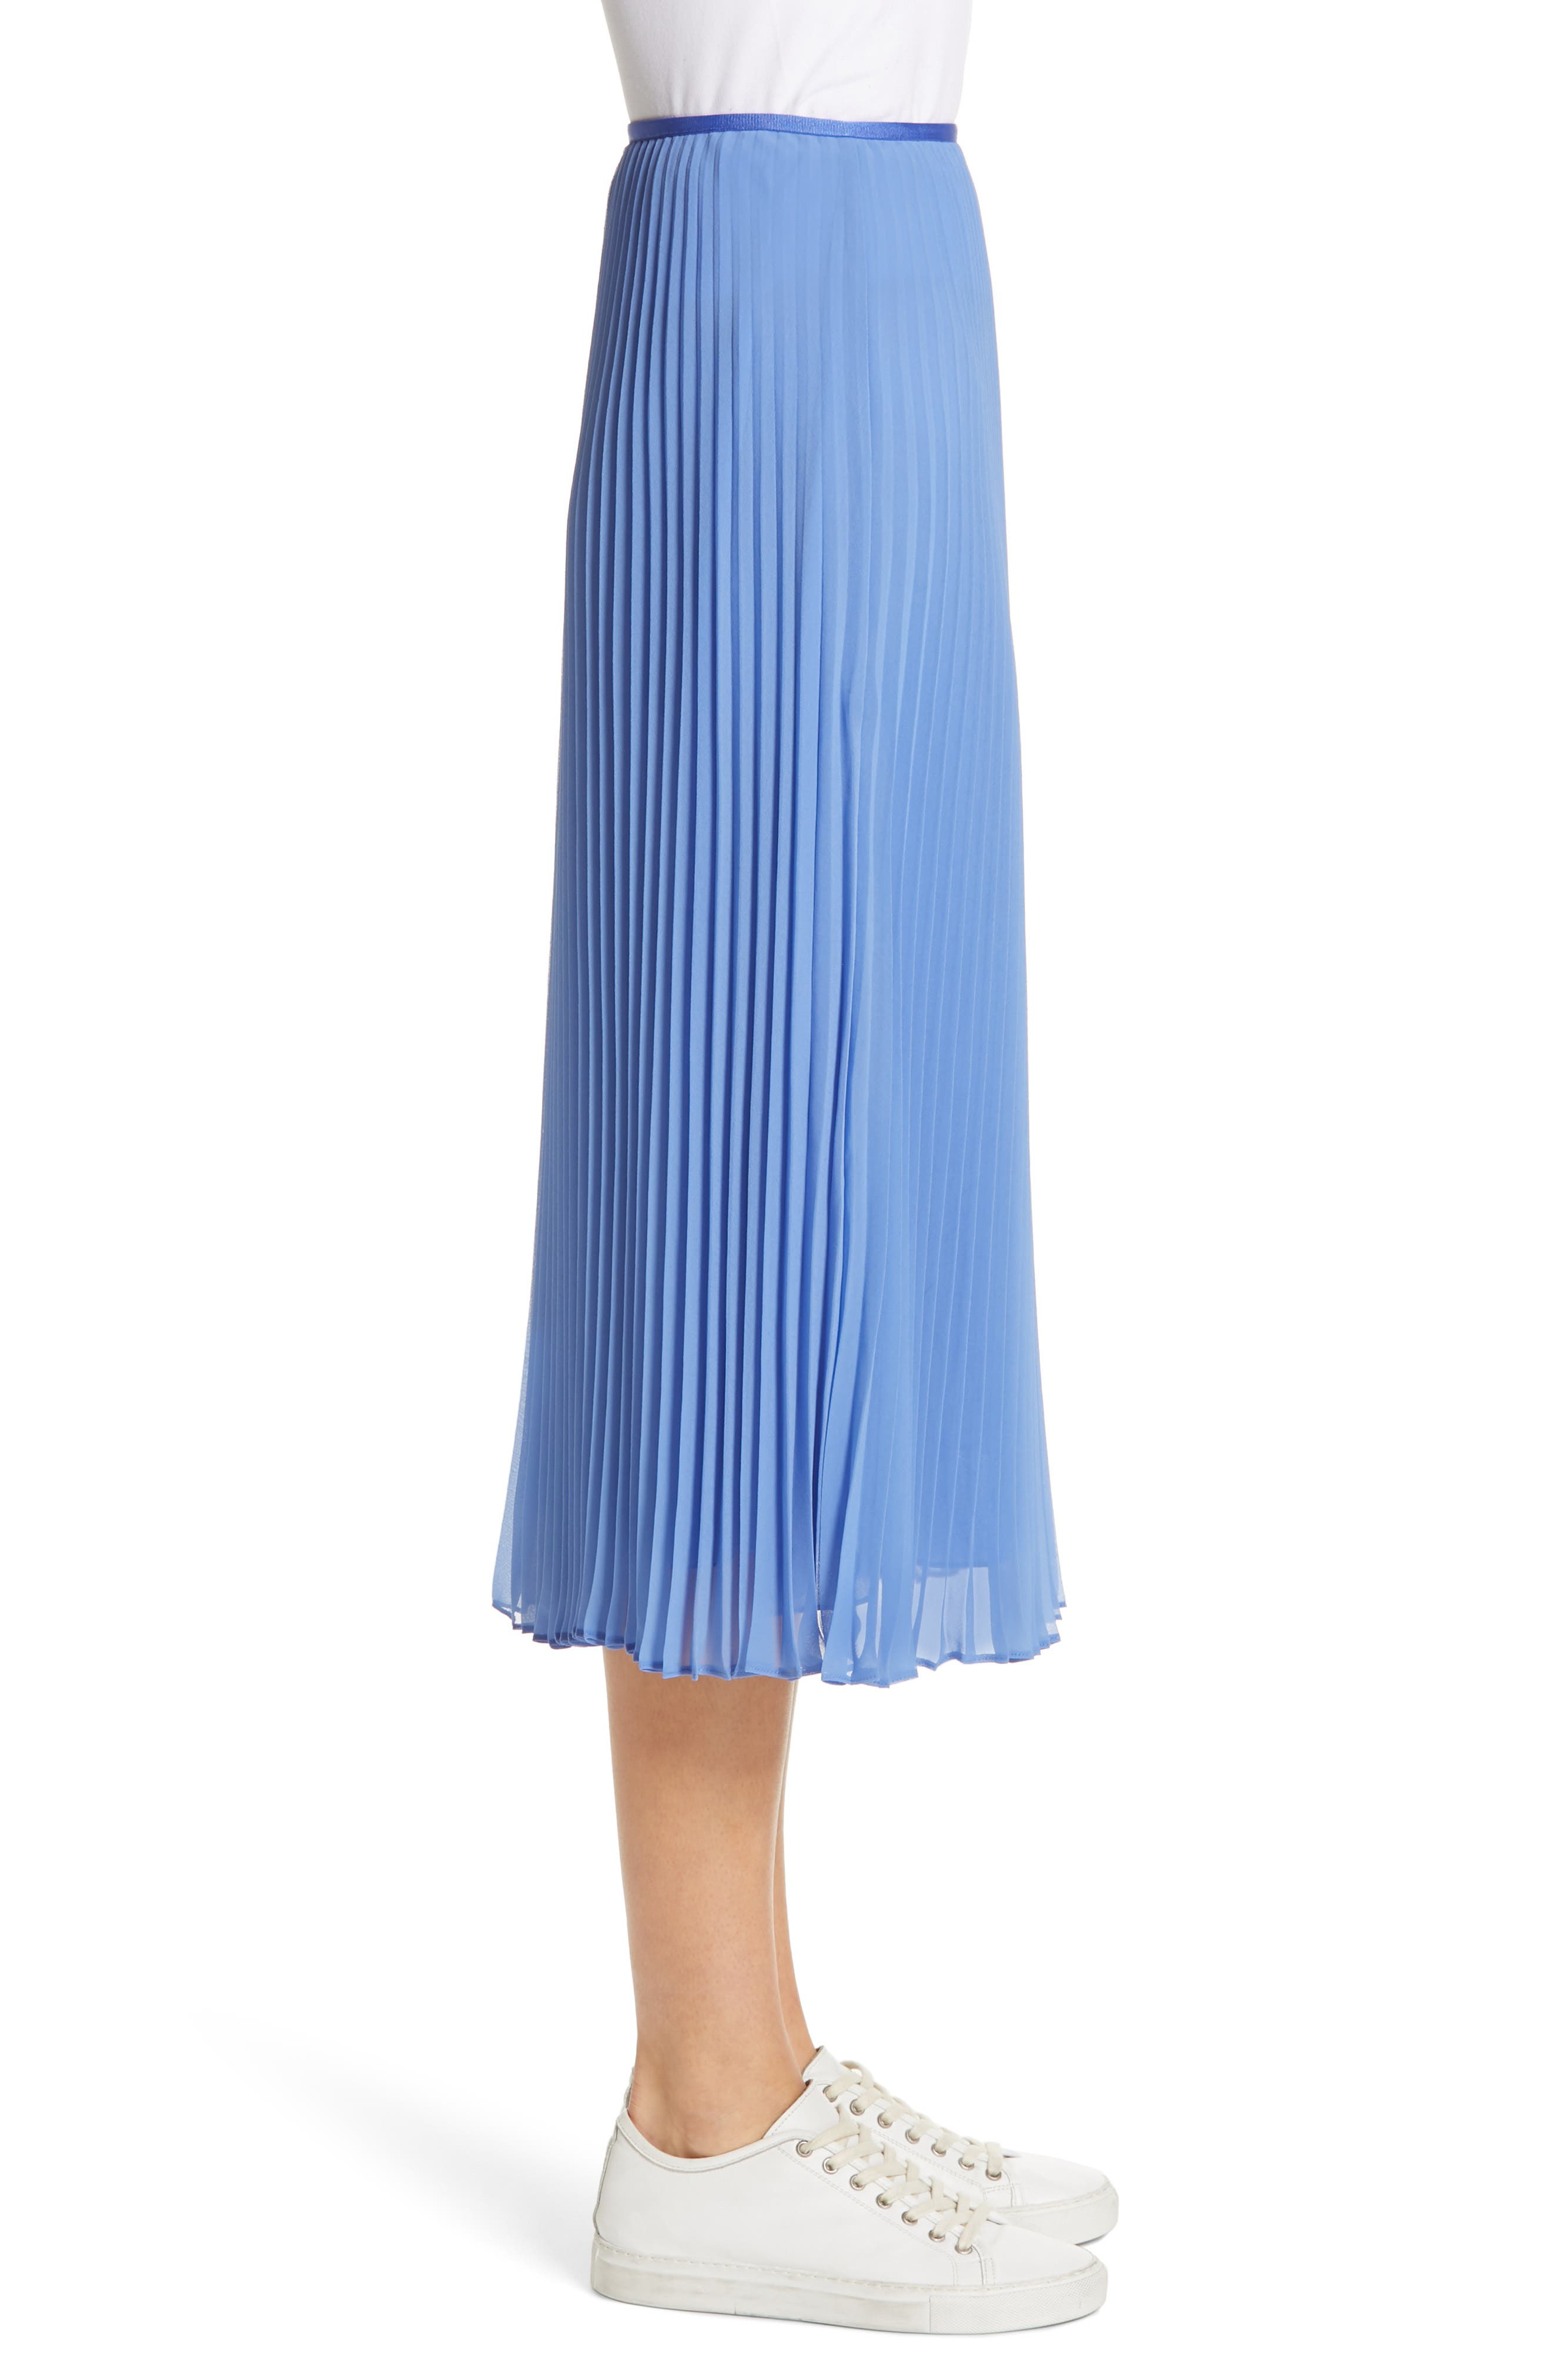 Pleat Midi Skirt,                             Alternate thumbnail 3, color,                             BERMUDA BLUE